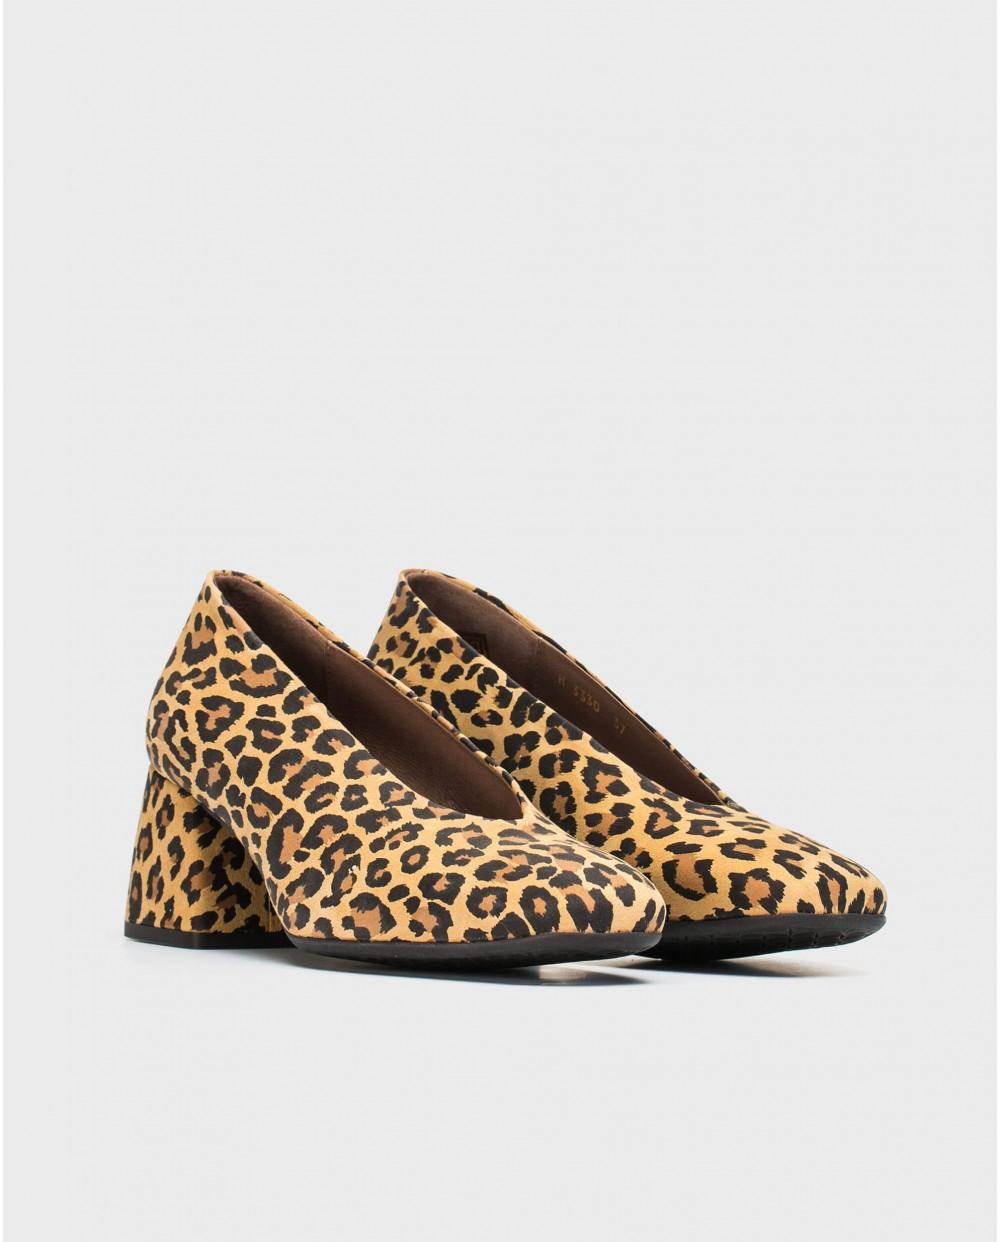 High heeled shoe with animal print